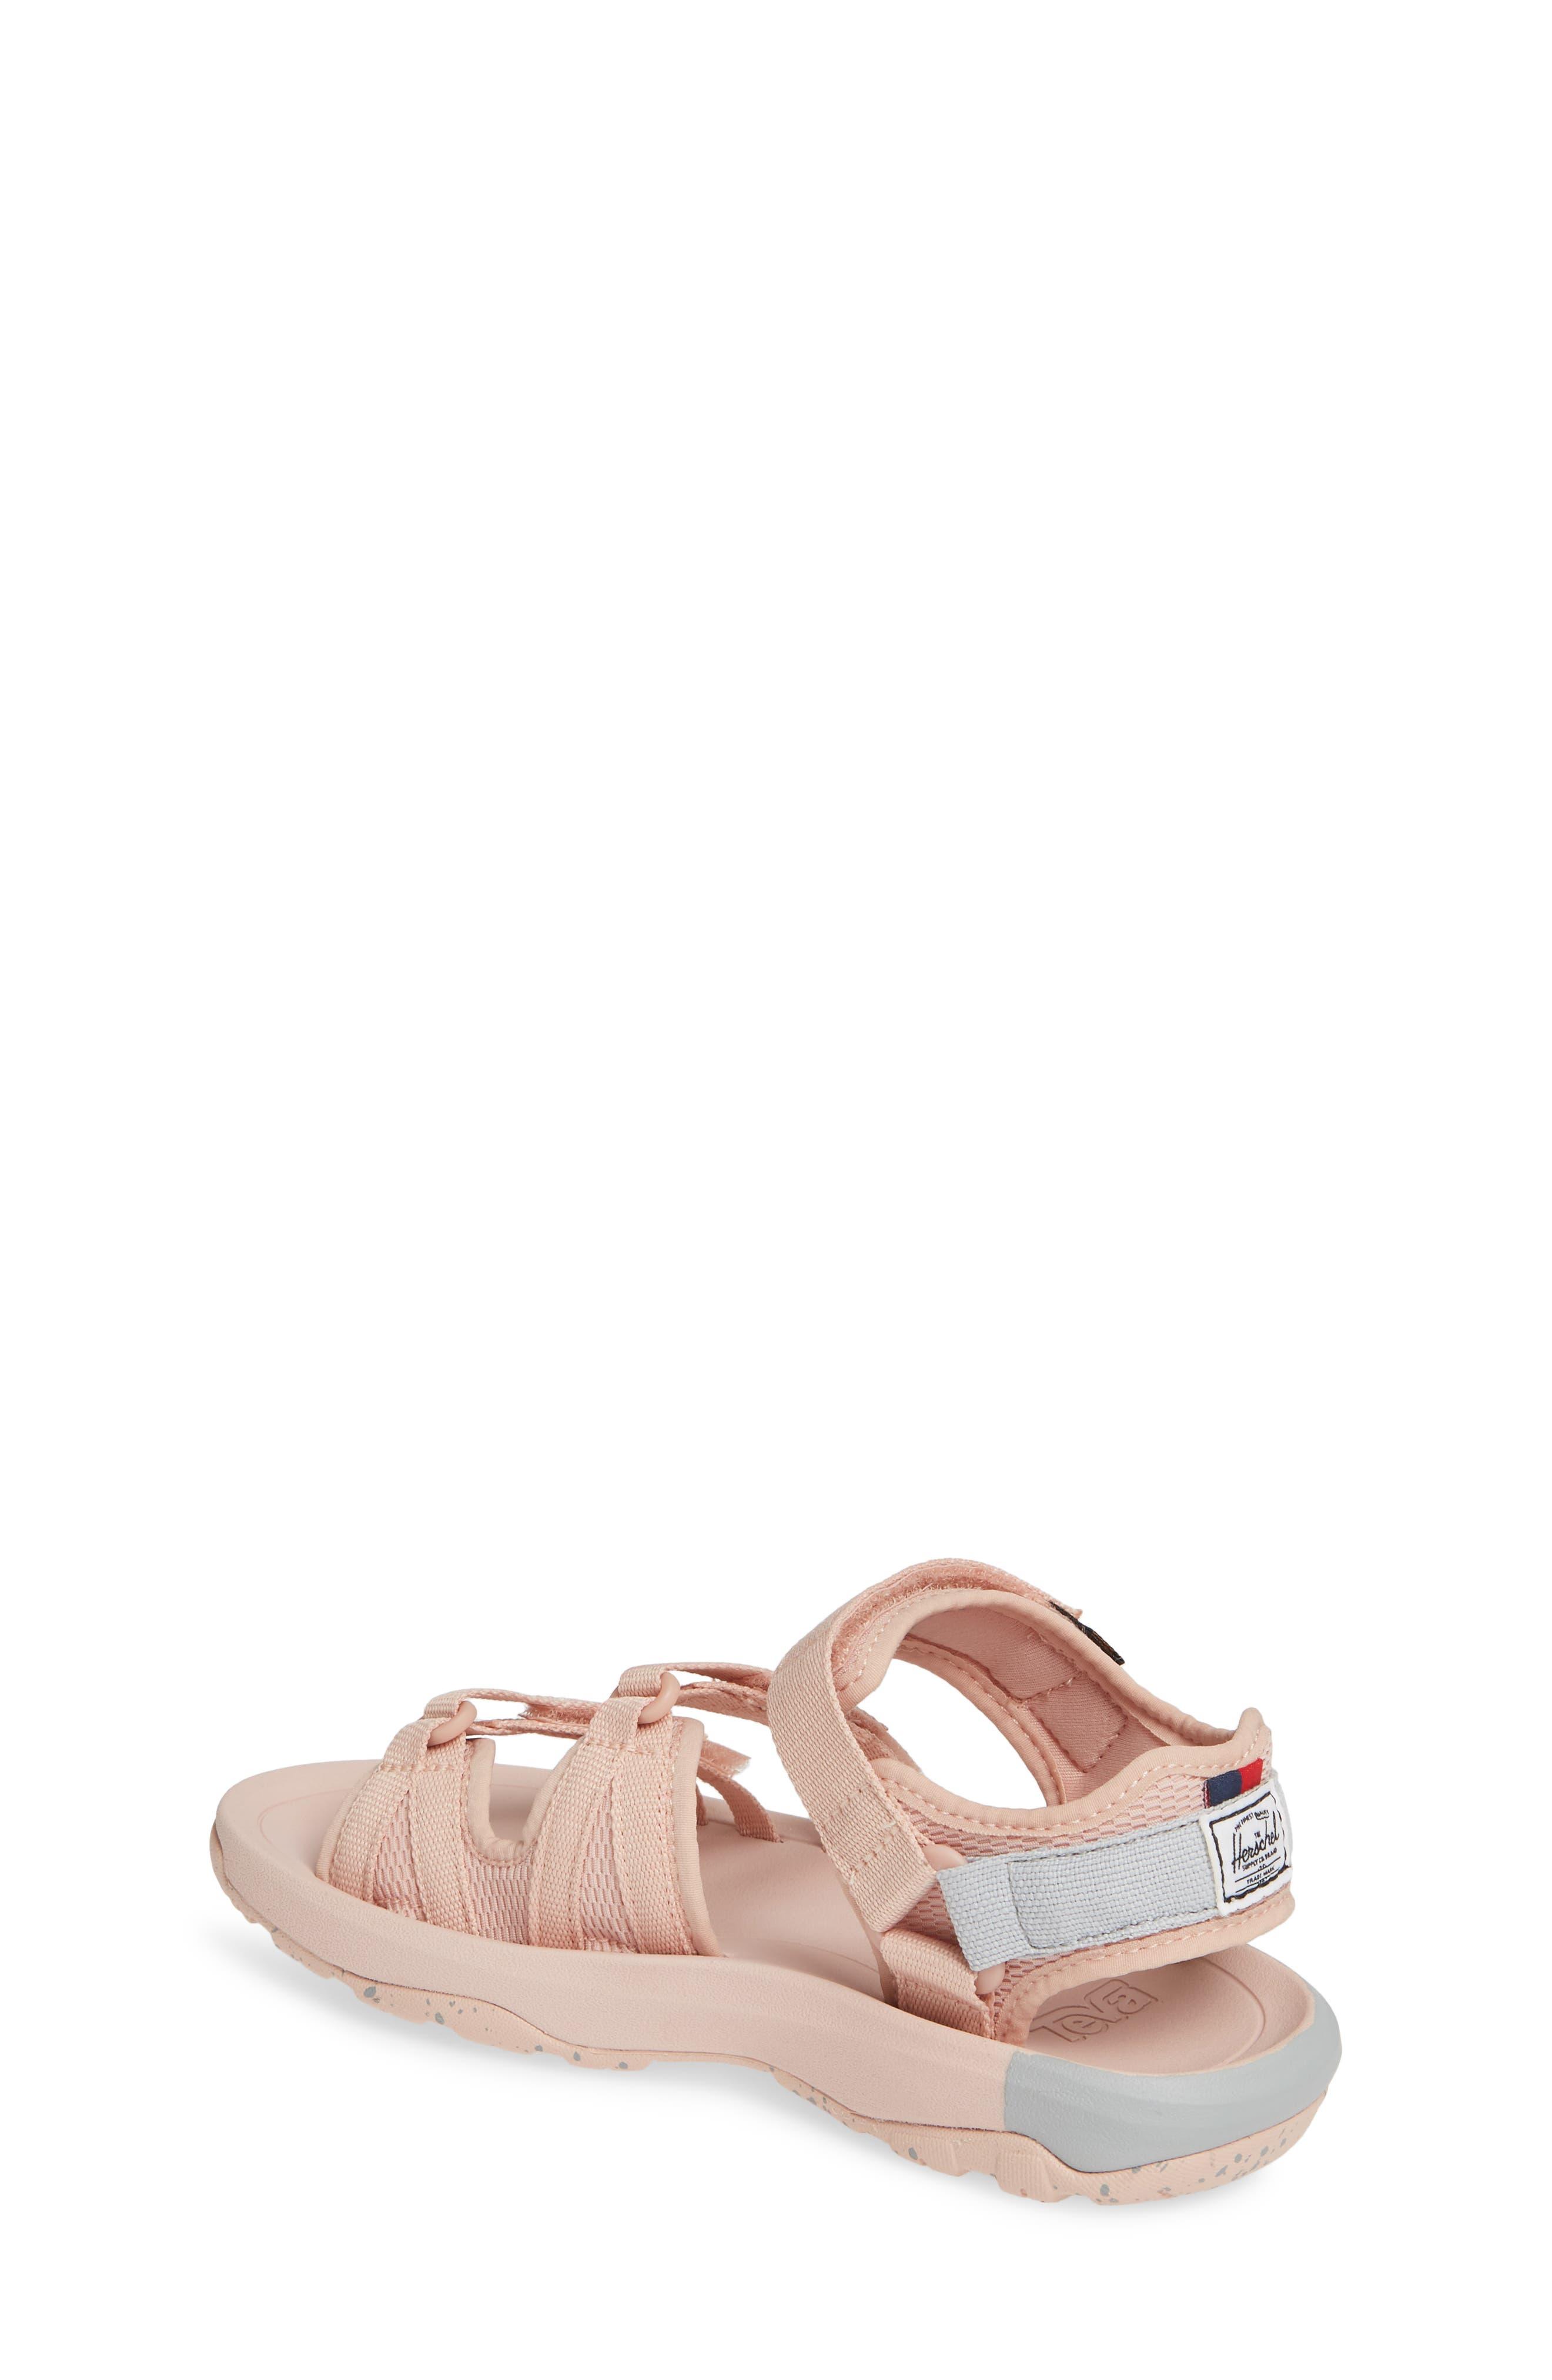 4cd8c02cd Girls  Teva Shoes